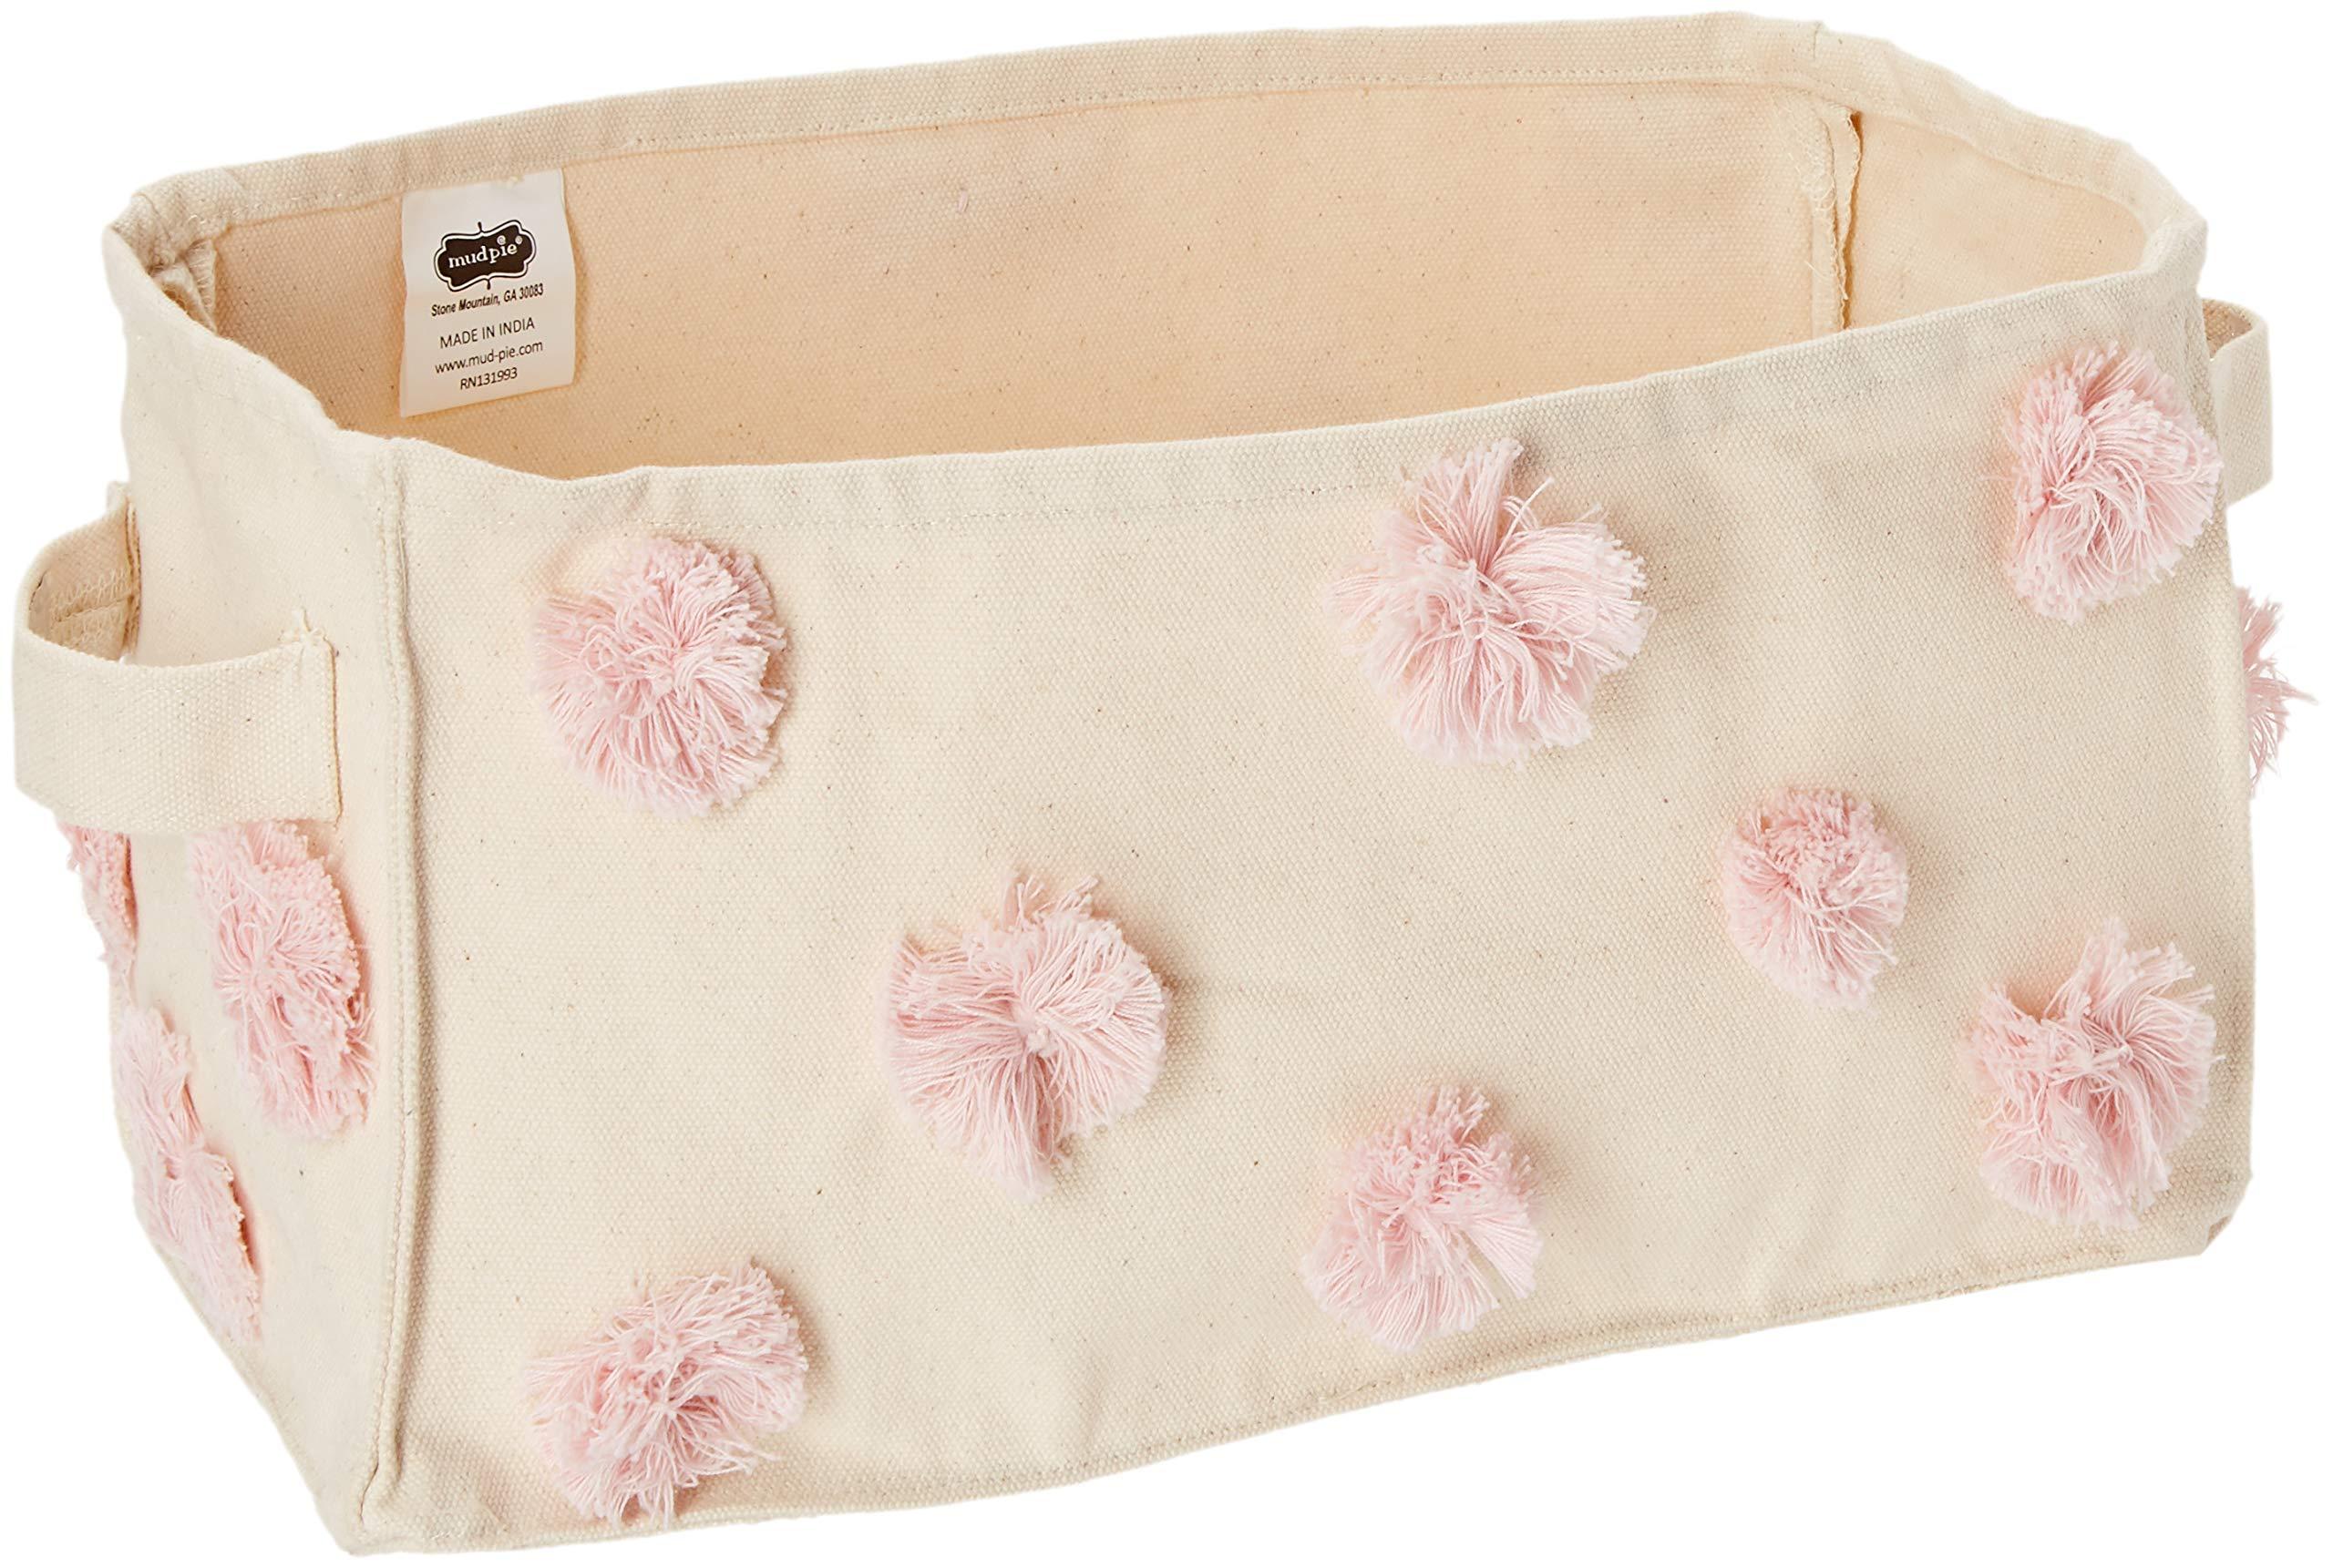 Mud Pie Nursery Decor Rectangular Pom-Pom Canvas Storage Bin, Pink